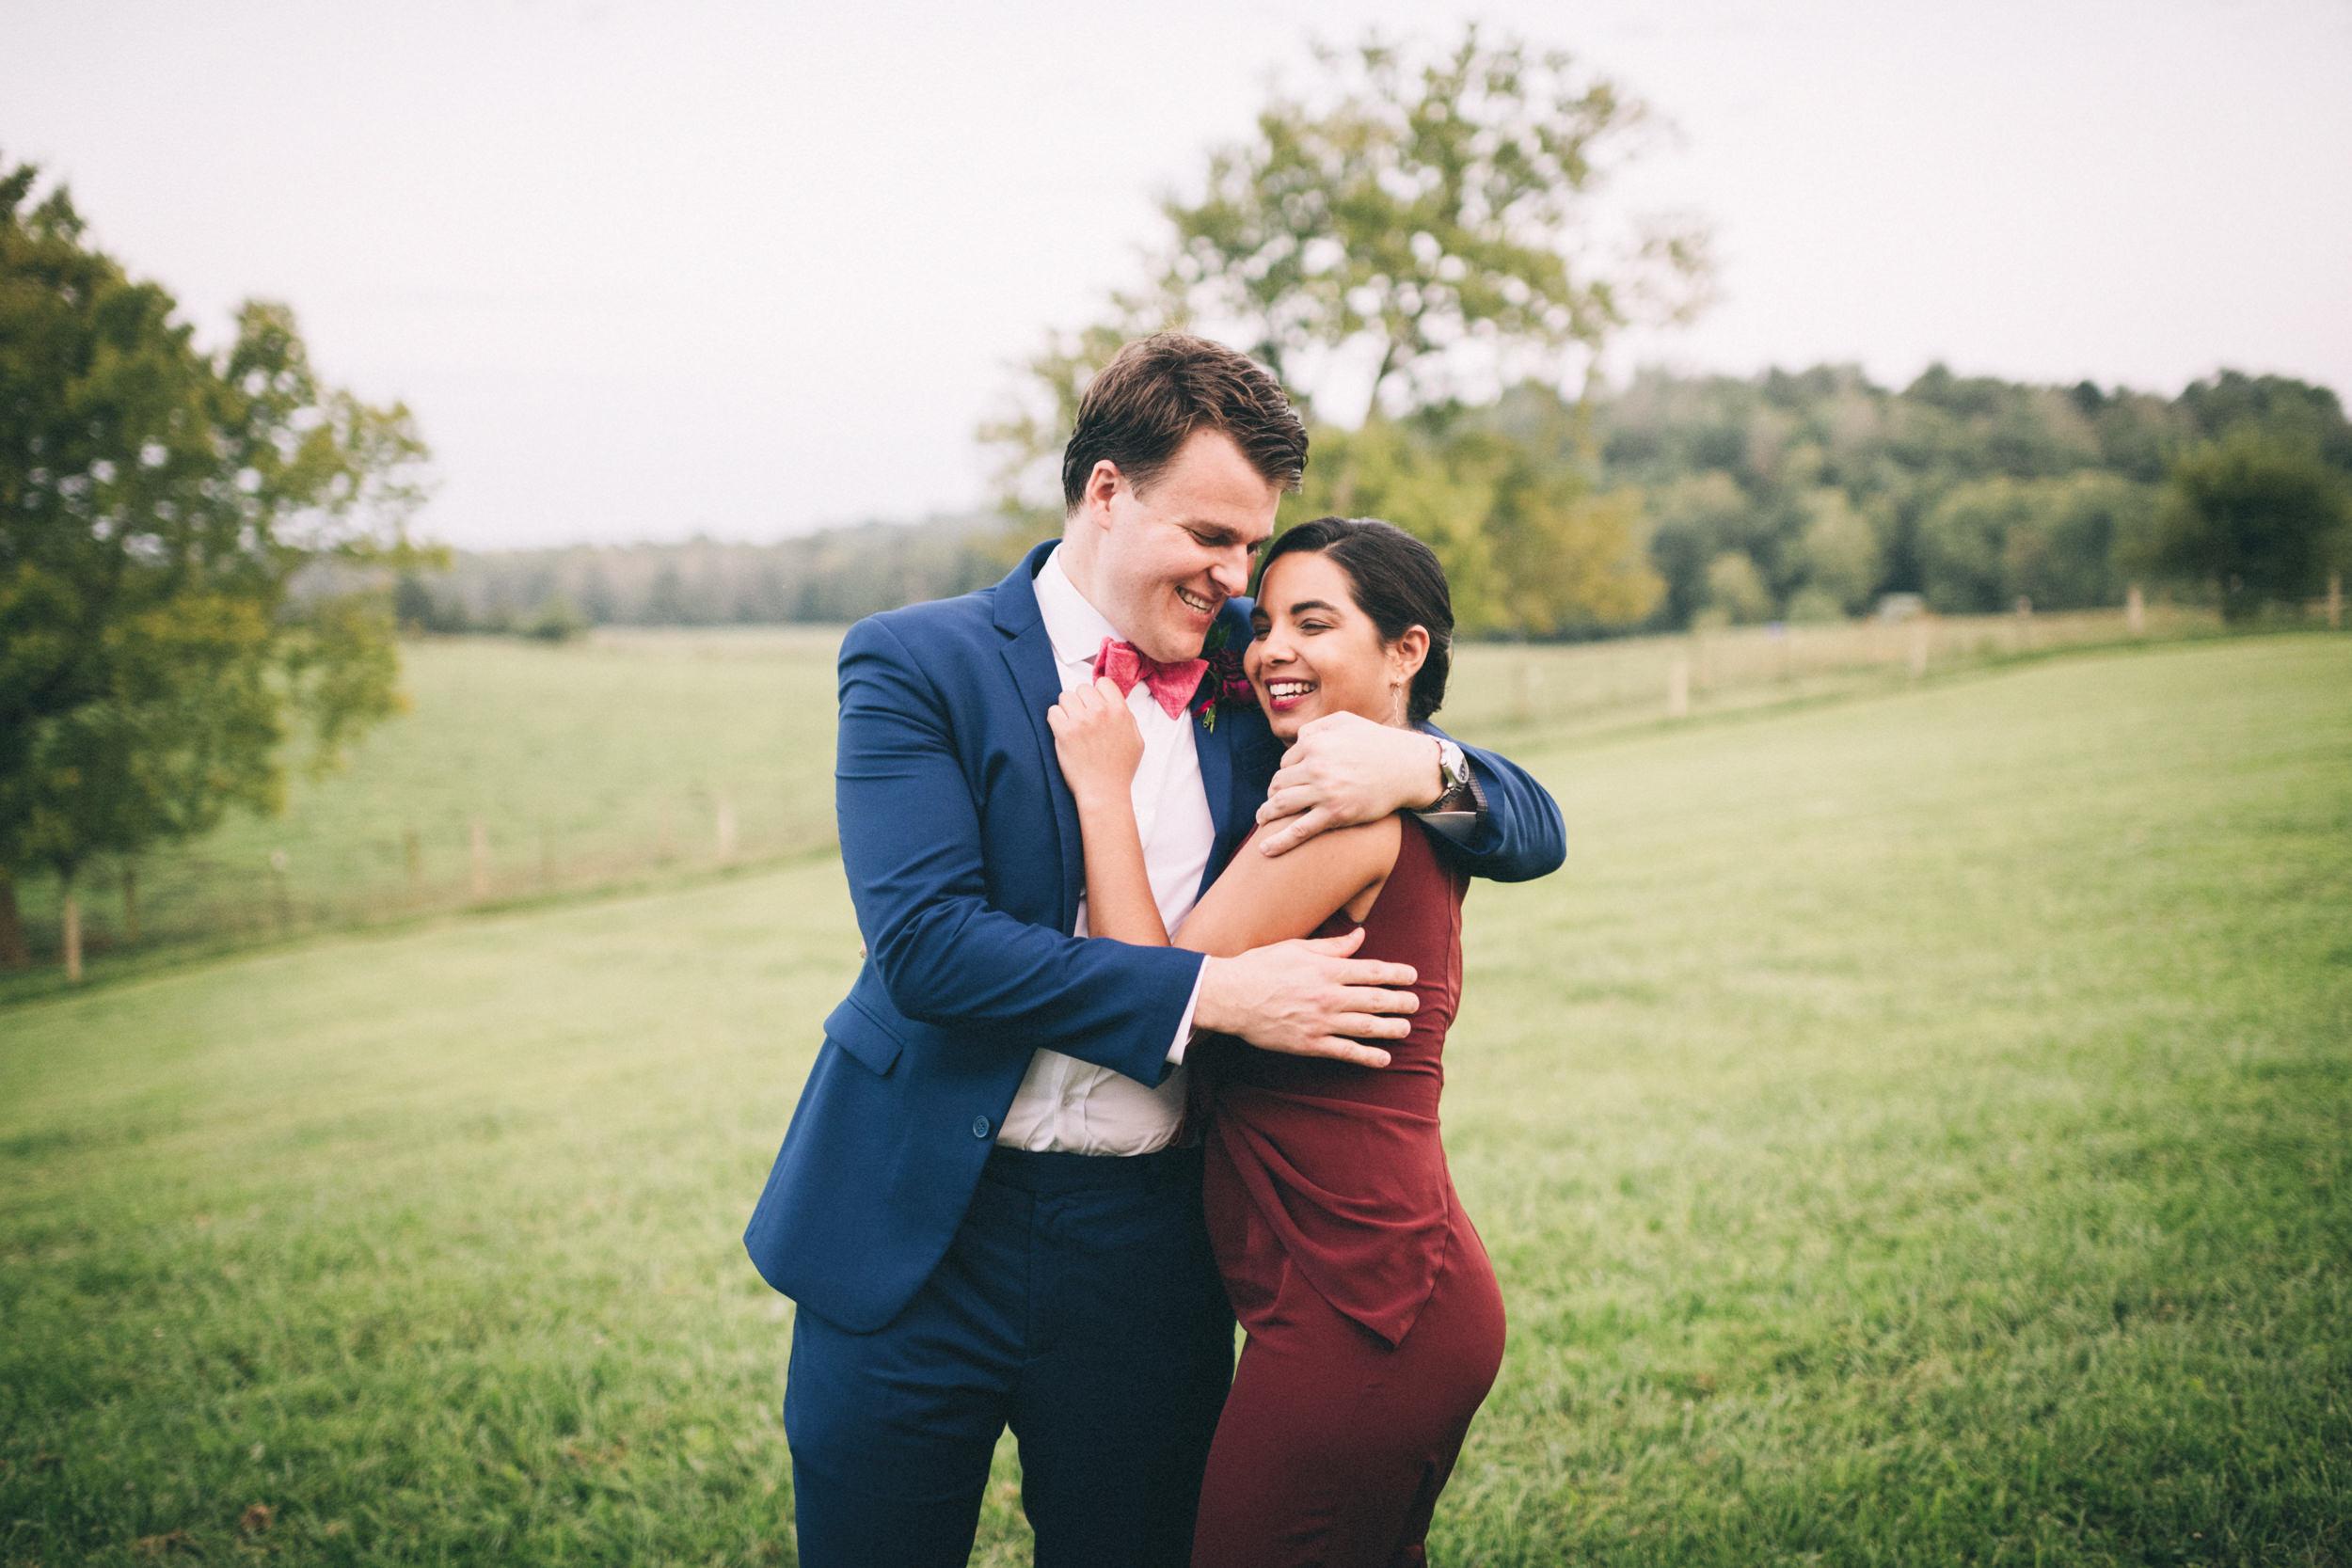 Louisville-Kentucky-Wedding-and-Elopement-Photographer-Sarah-Katherine-Davis-Photography-Summer-Jewel-Toned-Wedding-Chineese-Tea-Ceremony-Warrenwood-Manor-Danville-816.jpg